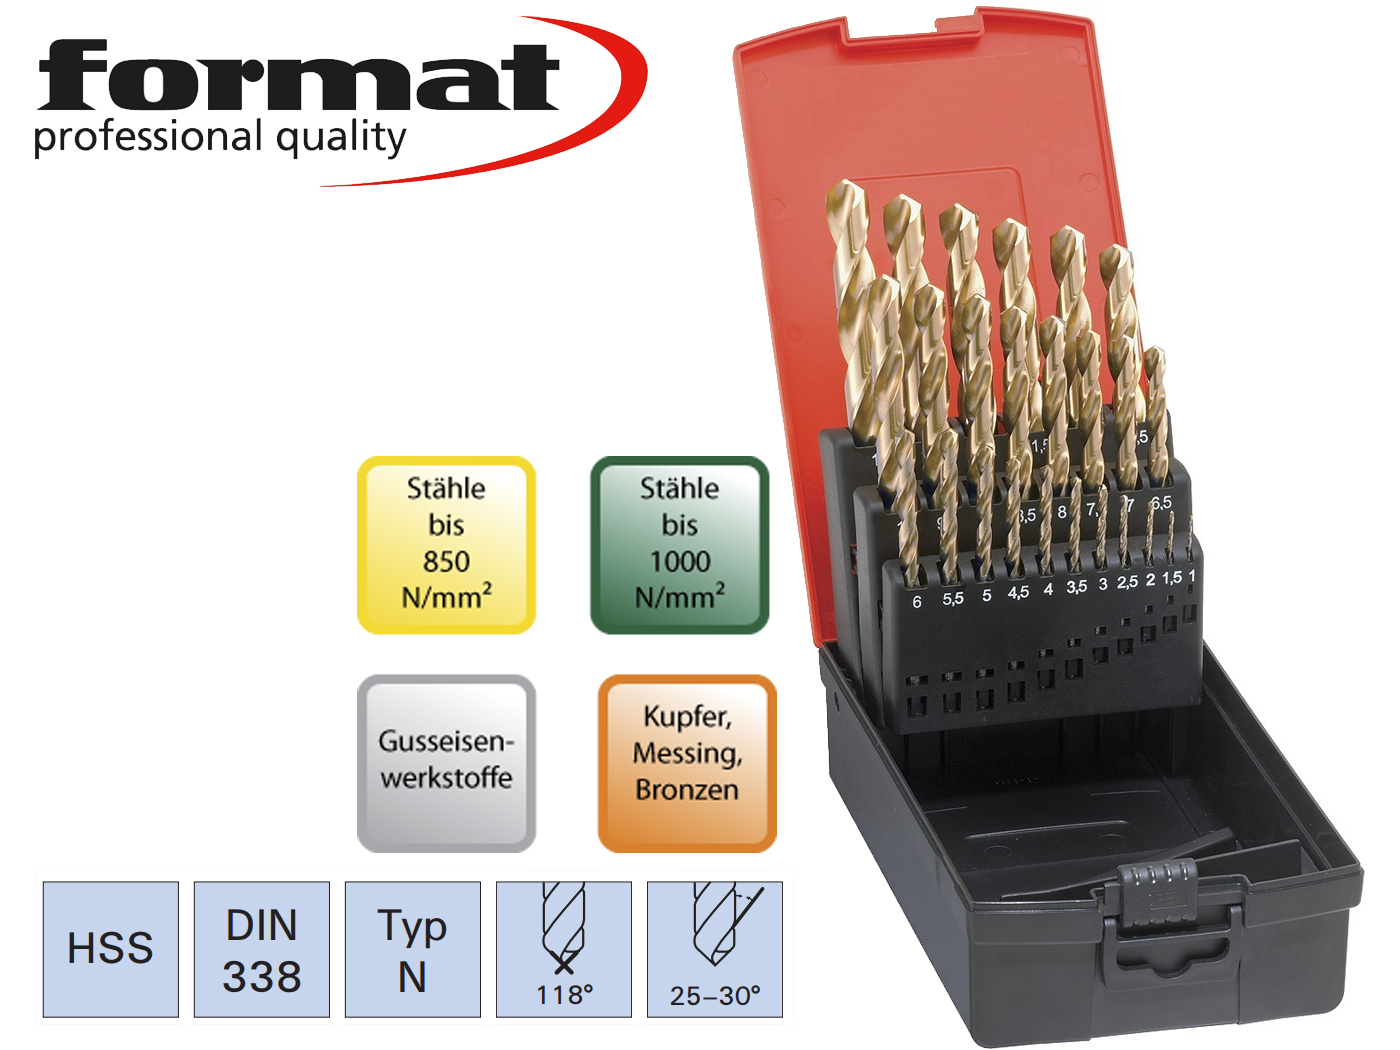 Spiraalboren set DIN 338 N TiN HSS geslepen Format | DKMTools - DKM Tools